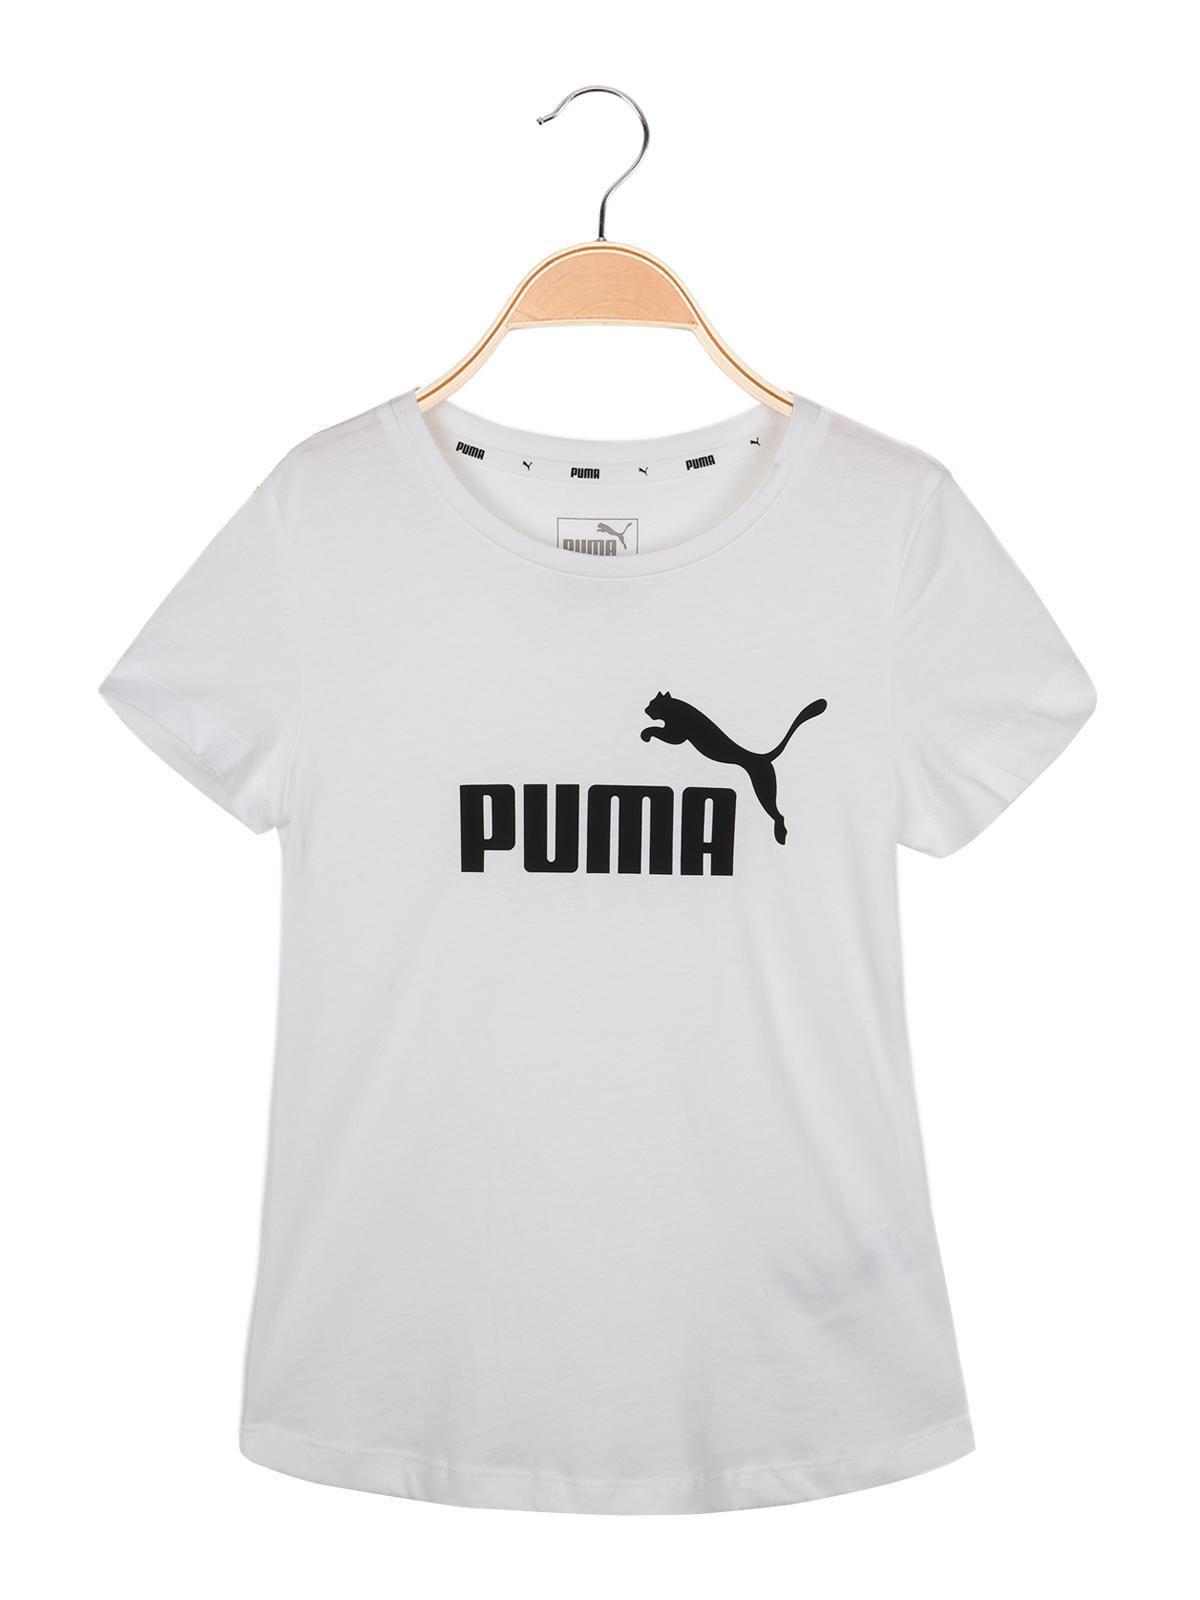 Essentials Tee T shirt bianca in cotone con stampa puma